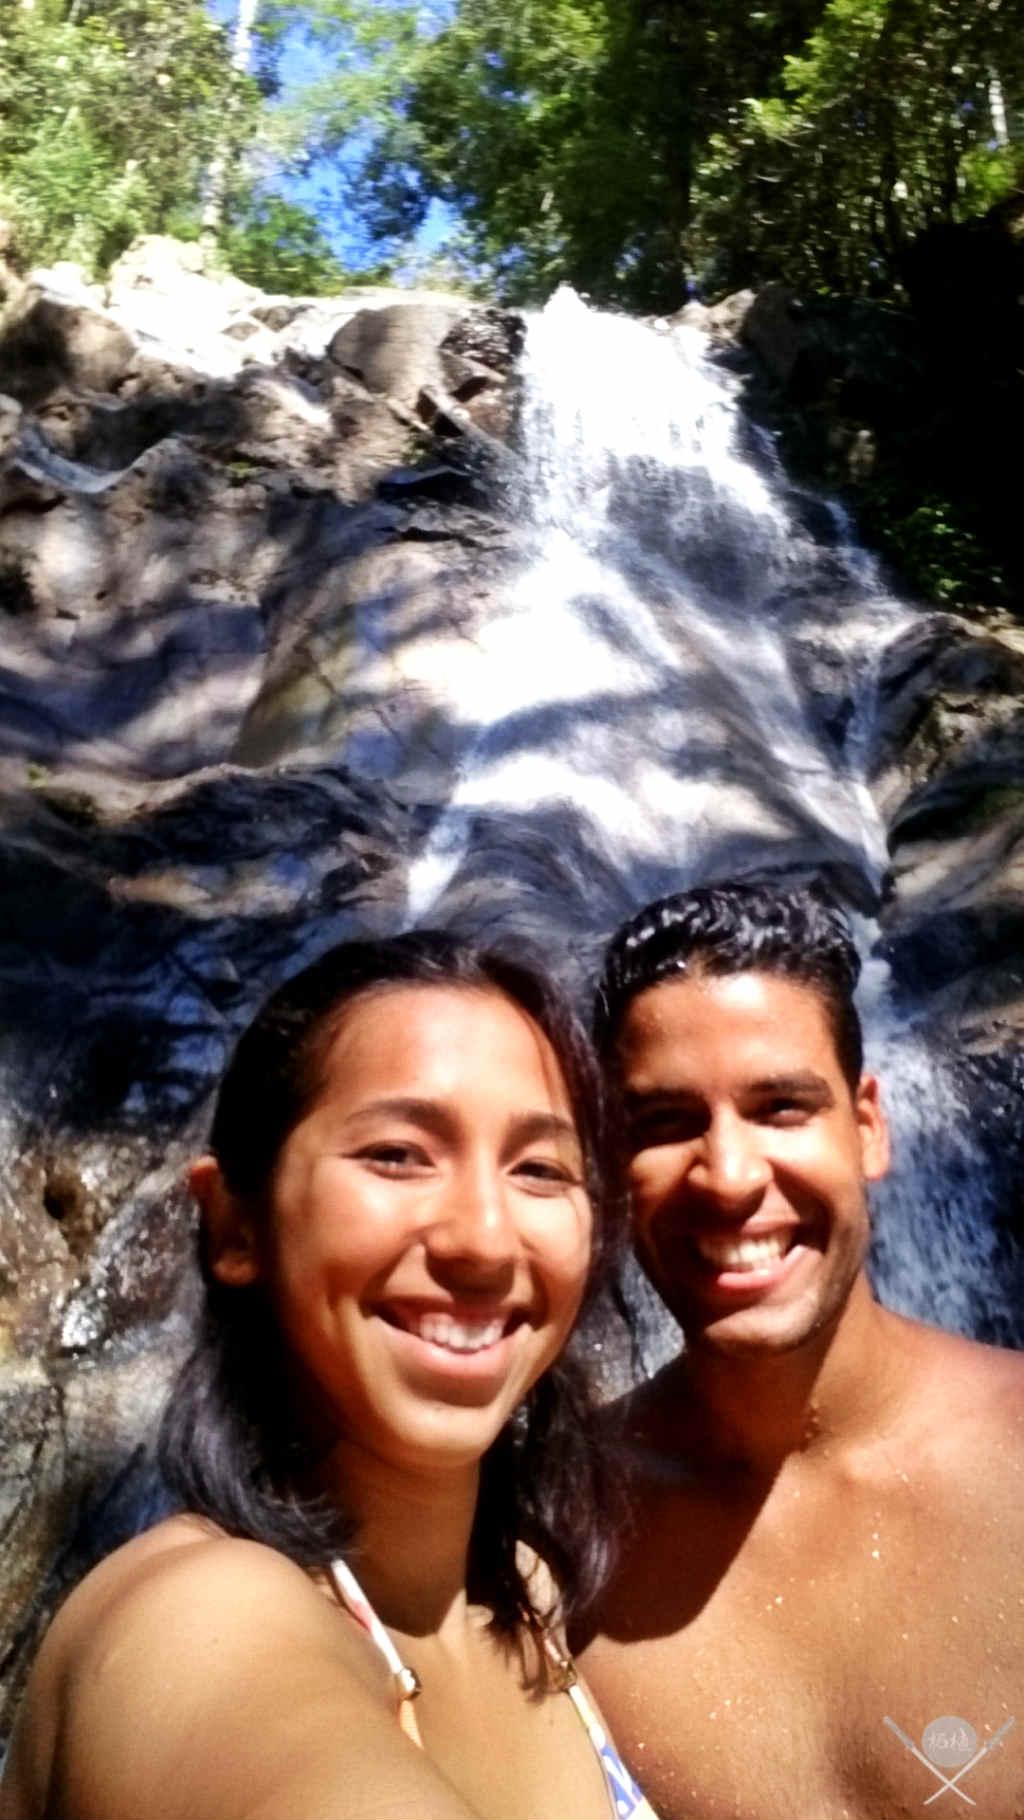 Thailand - Chiang Mai - Trekking Trilha 2 - Viagens - Vida de Tsuge - VDT